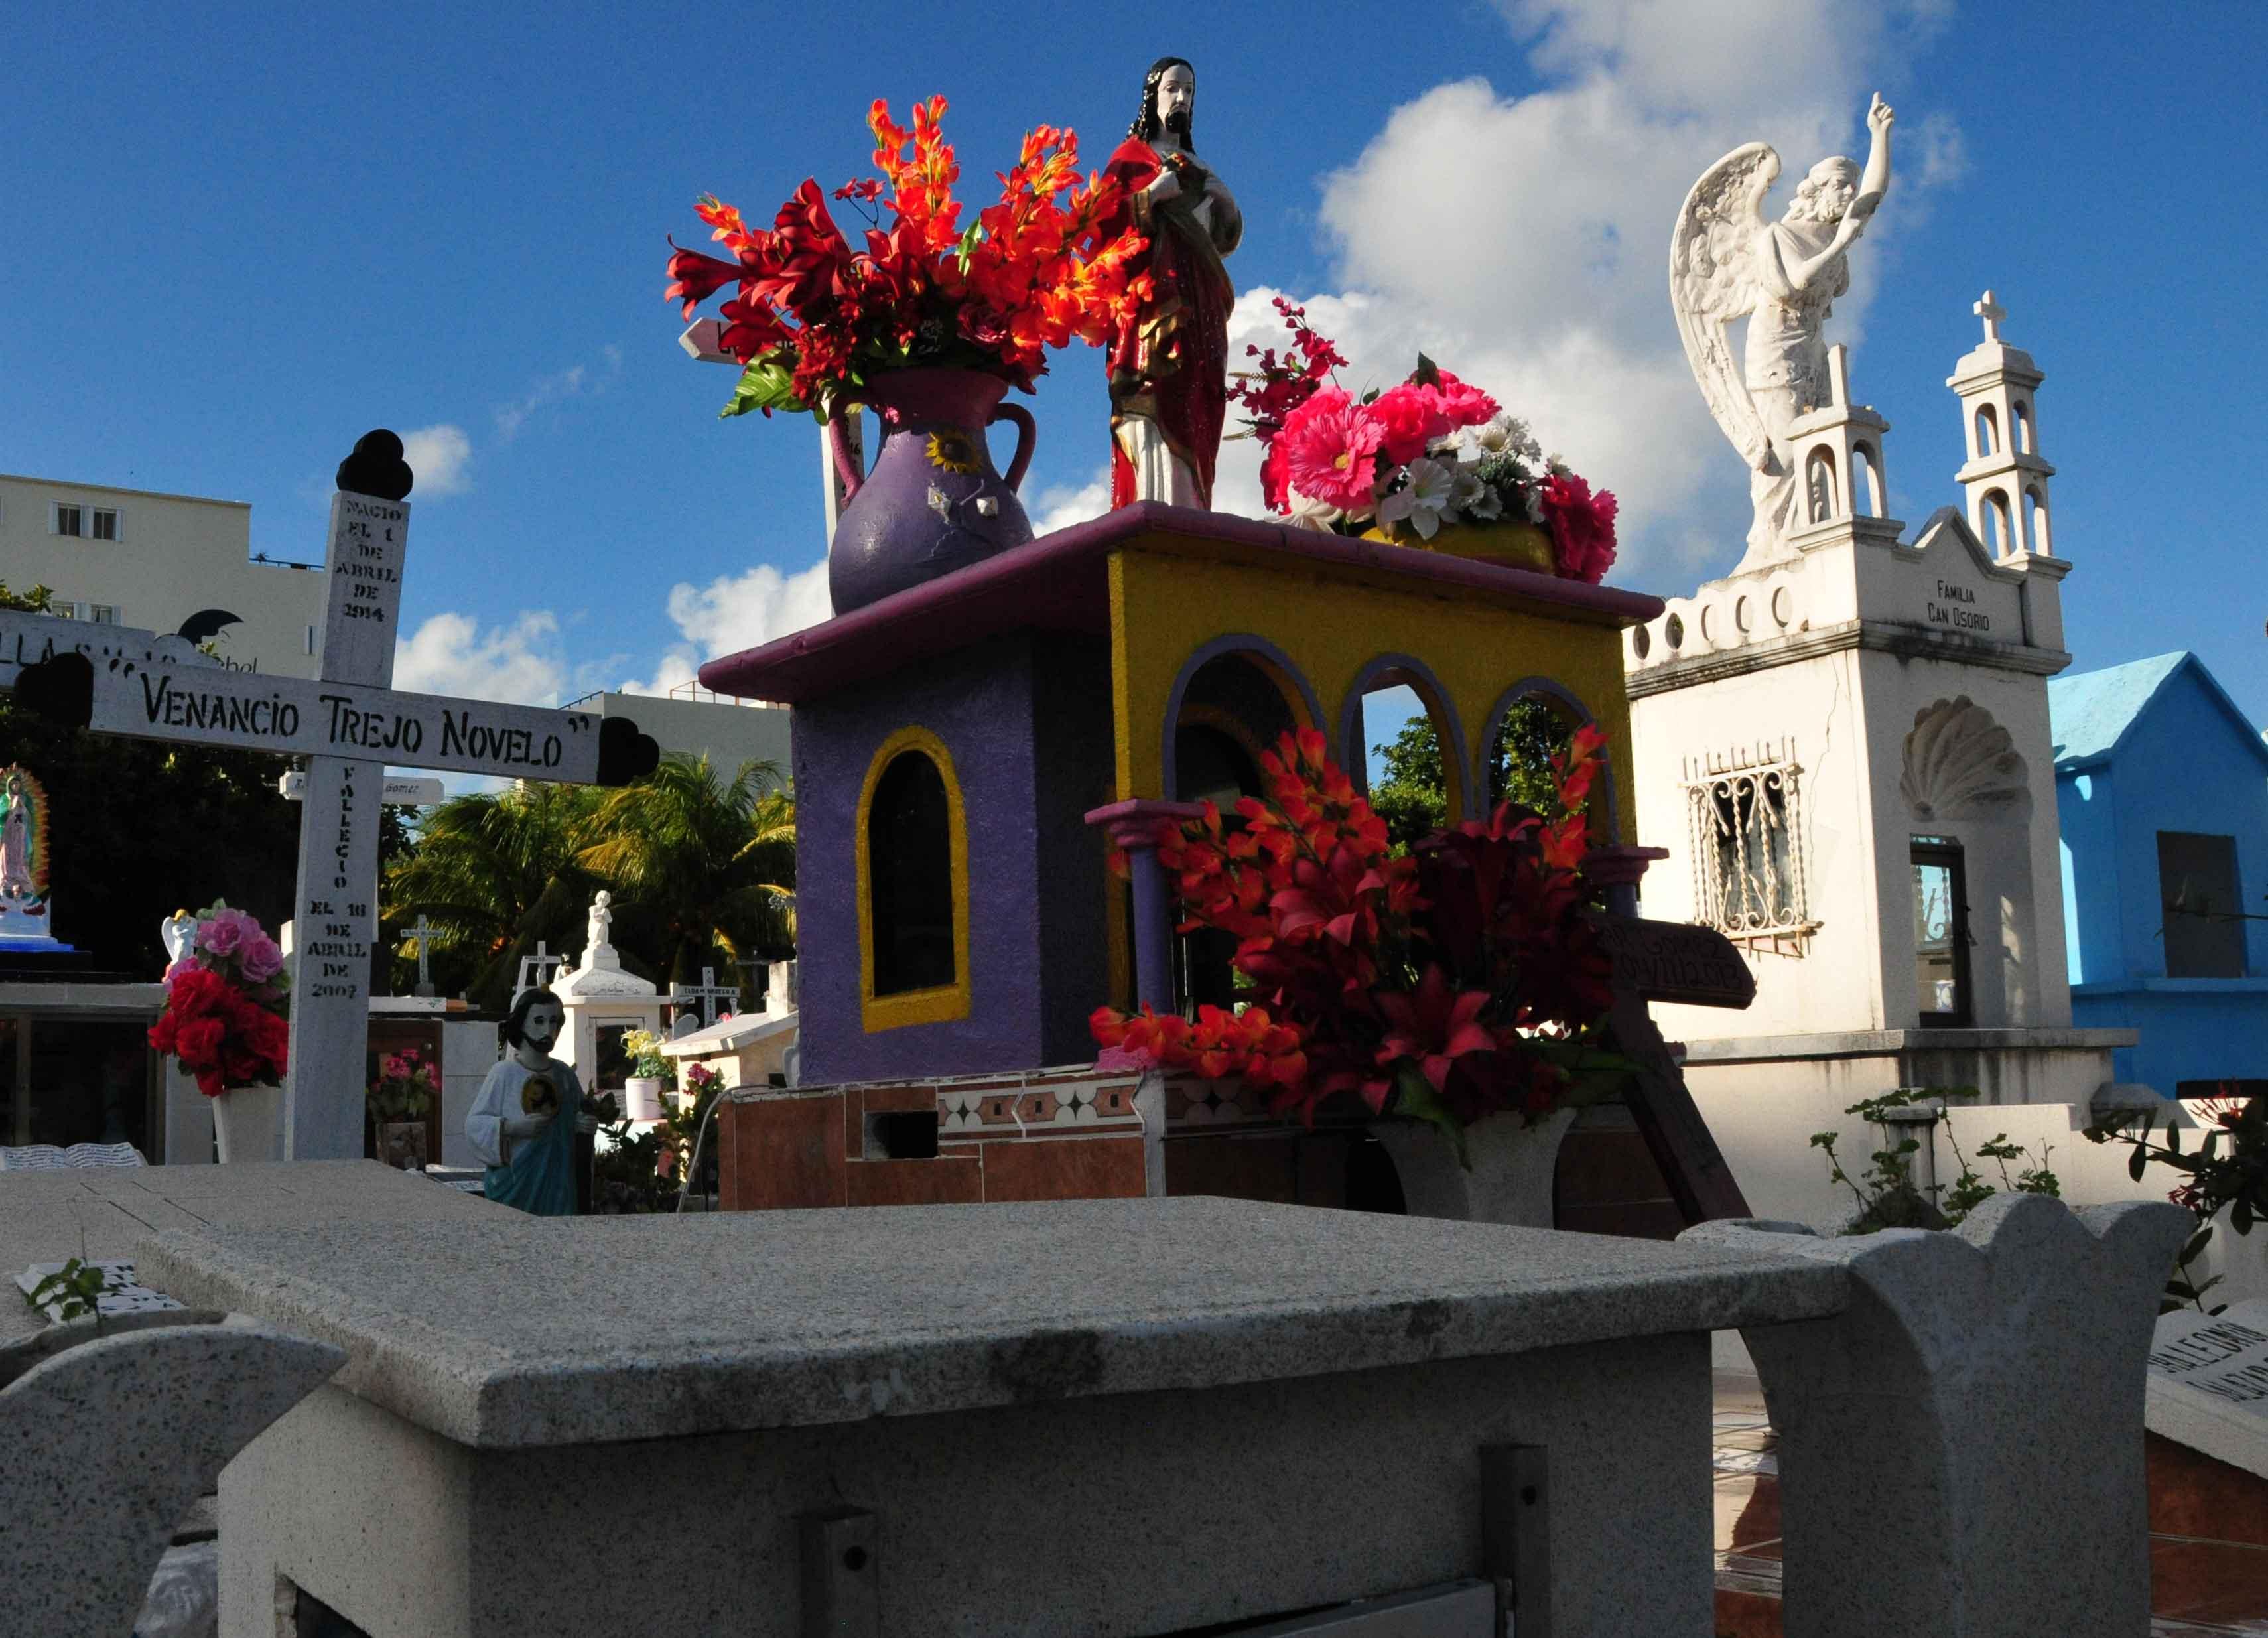 Farbenfroher mexikanischer Friedhof.